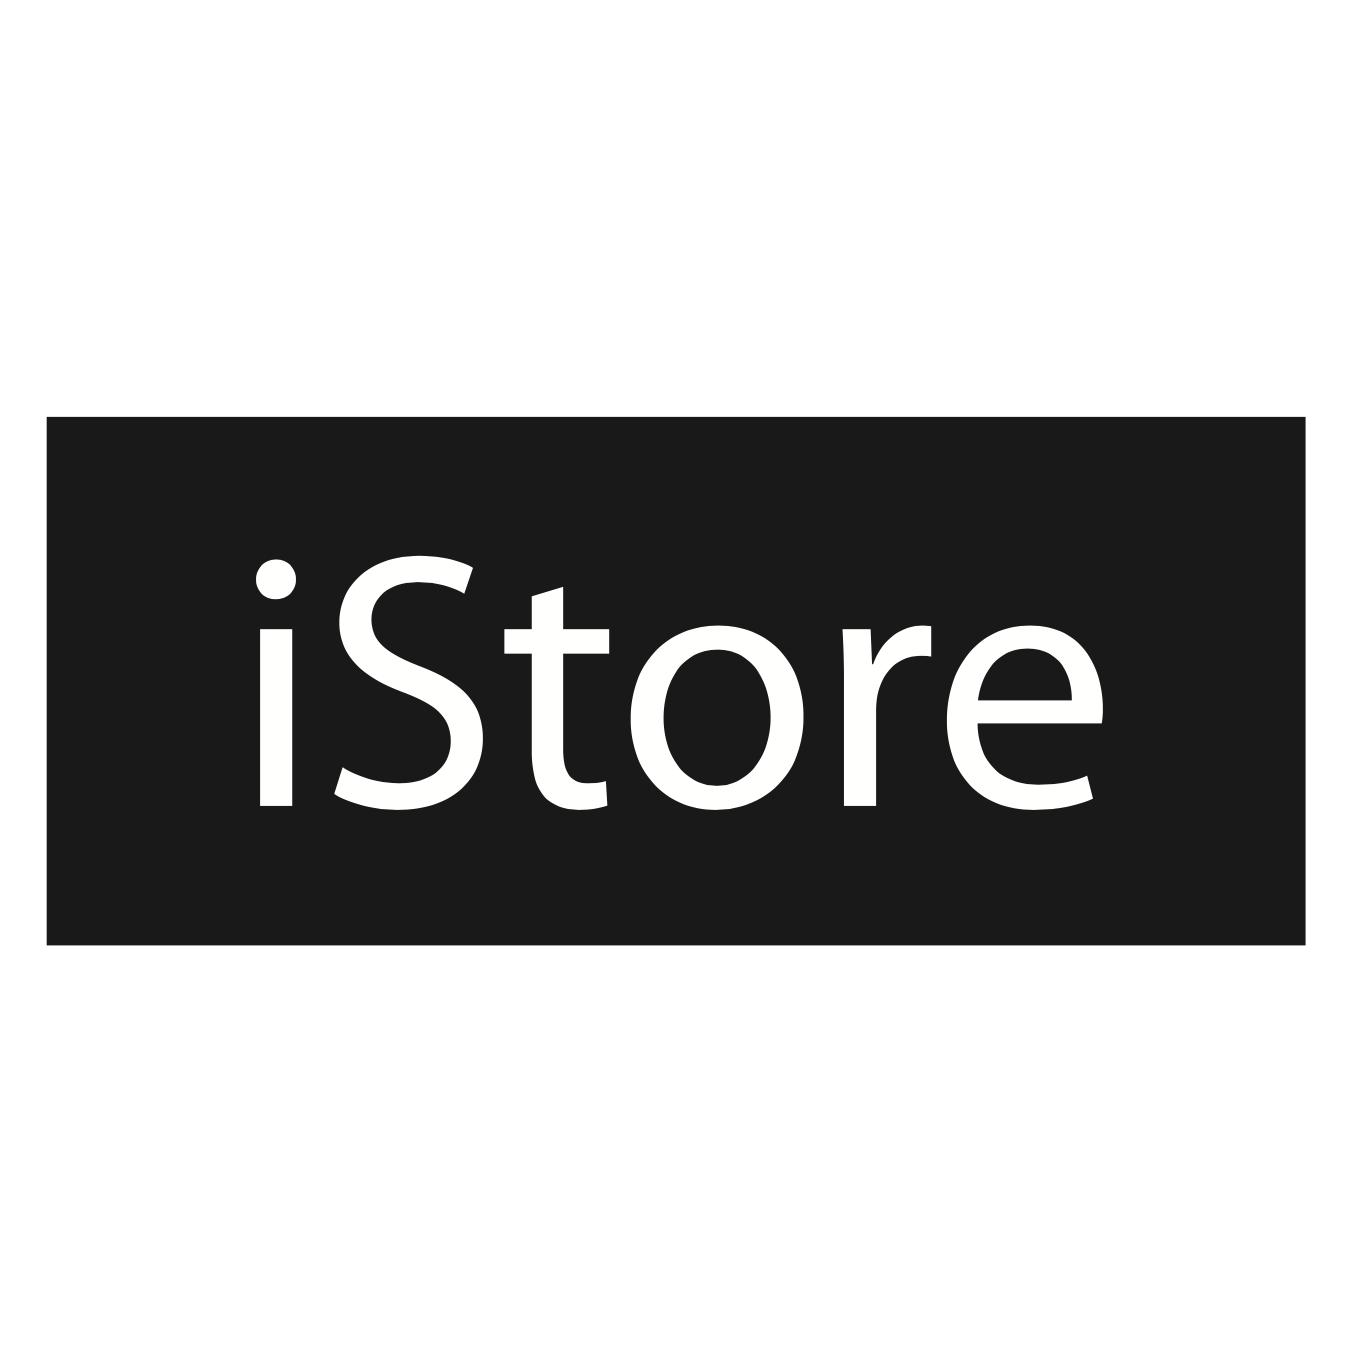 iPhone 6s Plus 16GB - Silver